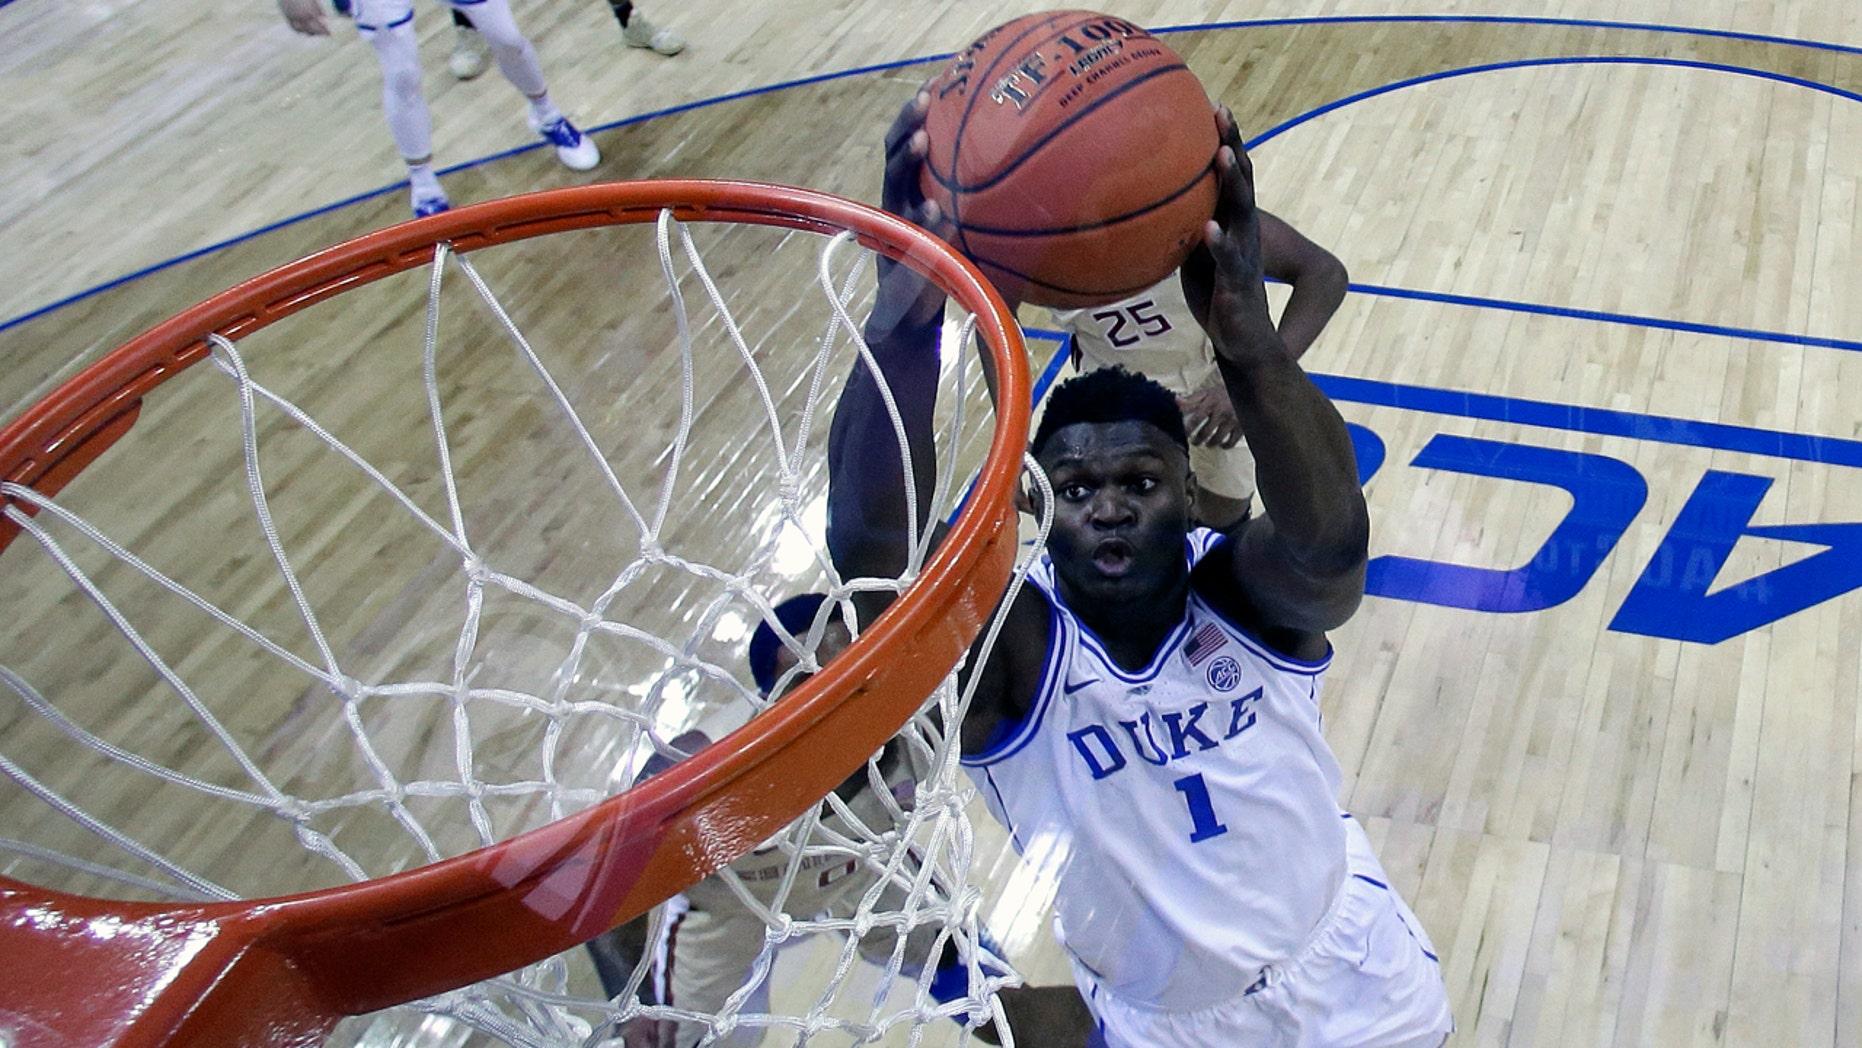 Zion Williamson led Duke to the ACC Tournament title and a No. 1 seed.(AP Photo/Chuck Burton)